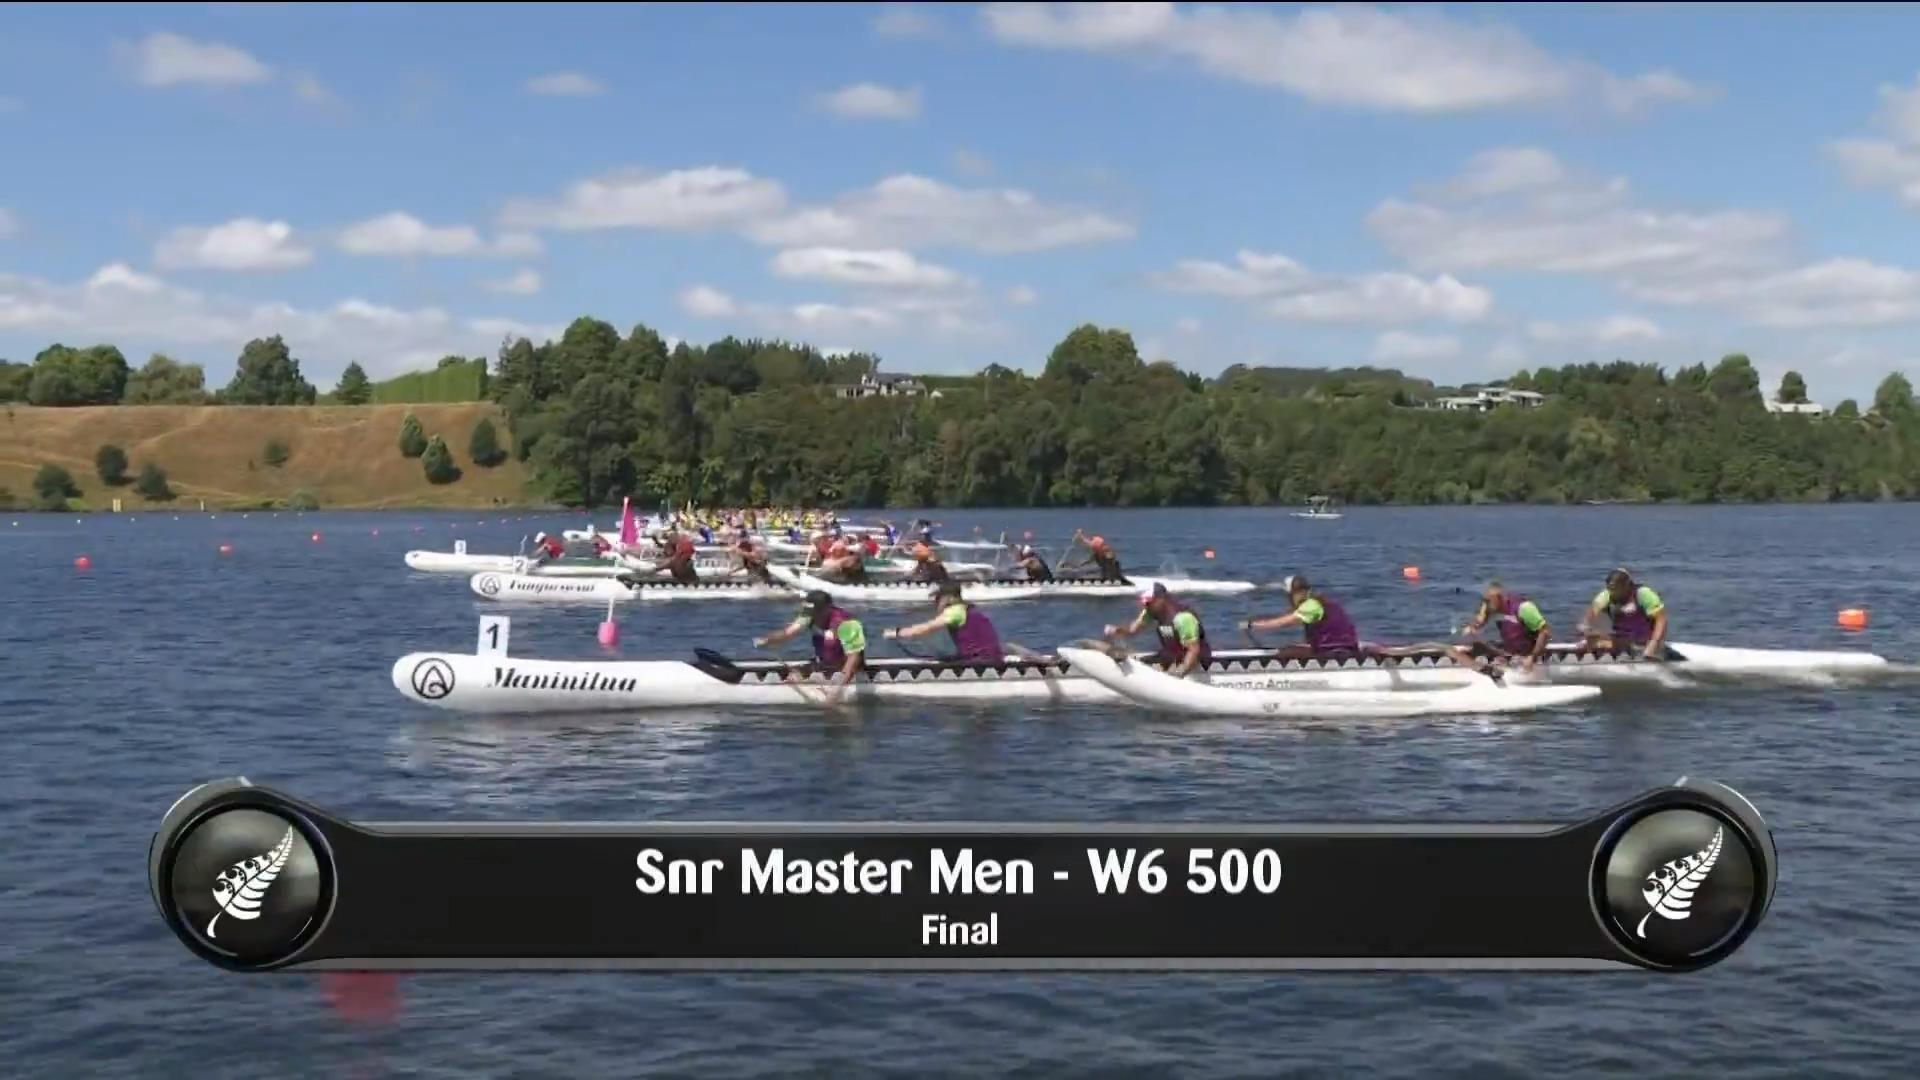 Video for 2019 Waka Ama Sprints - Snr Master Men - W6 500 Final